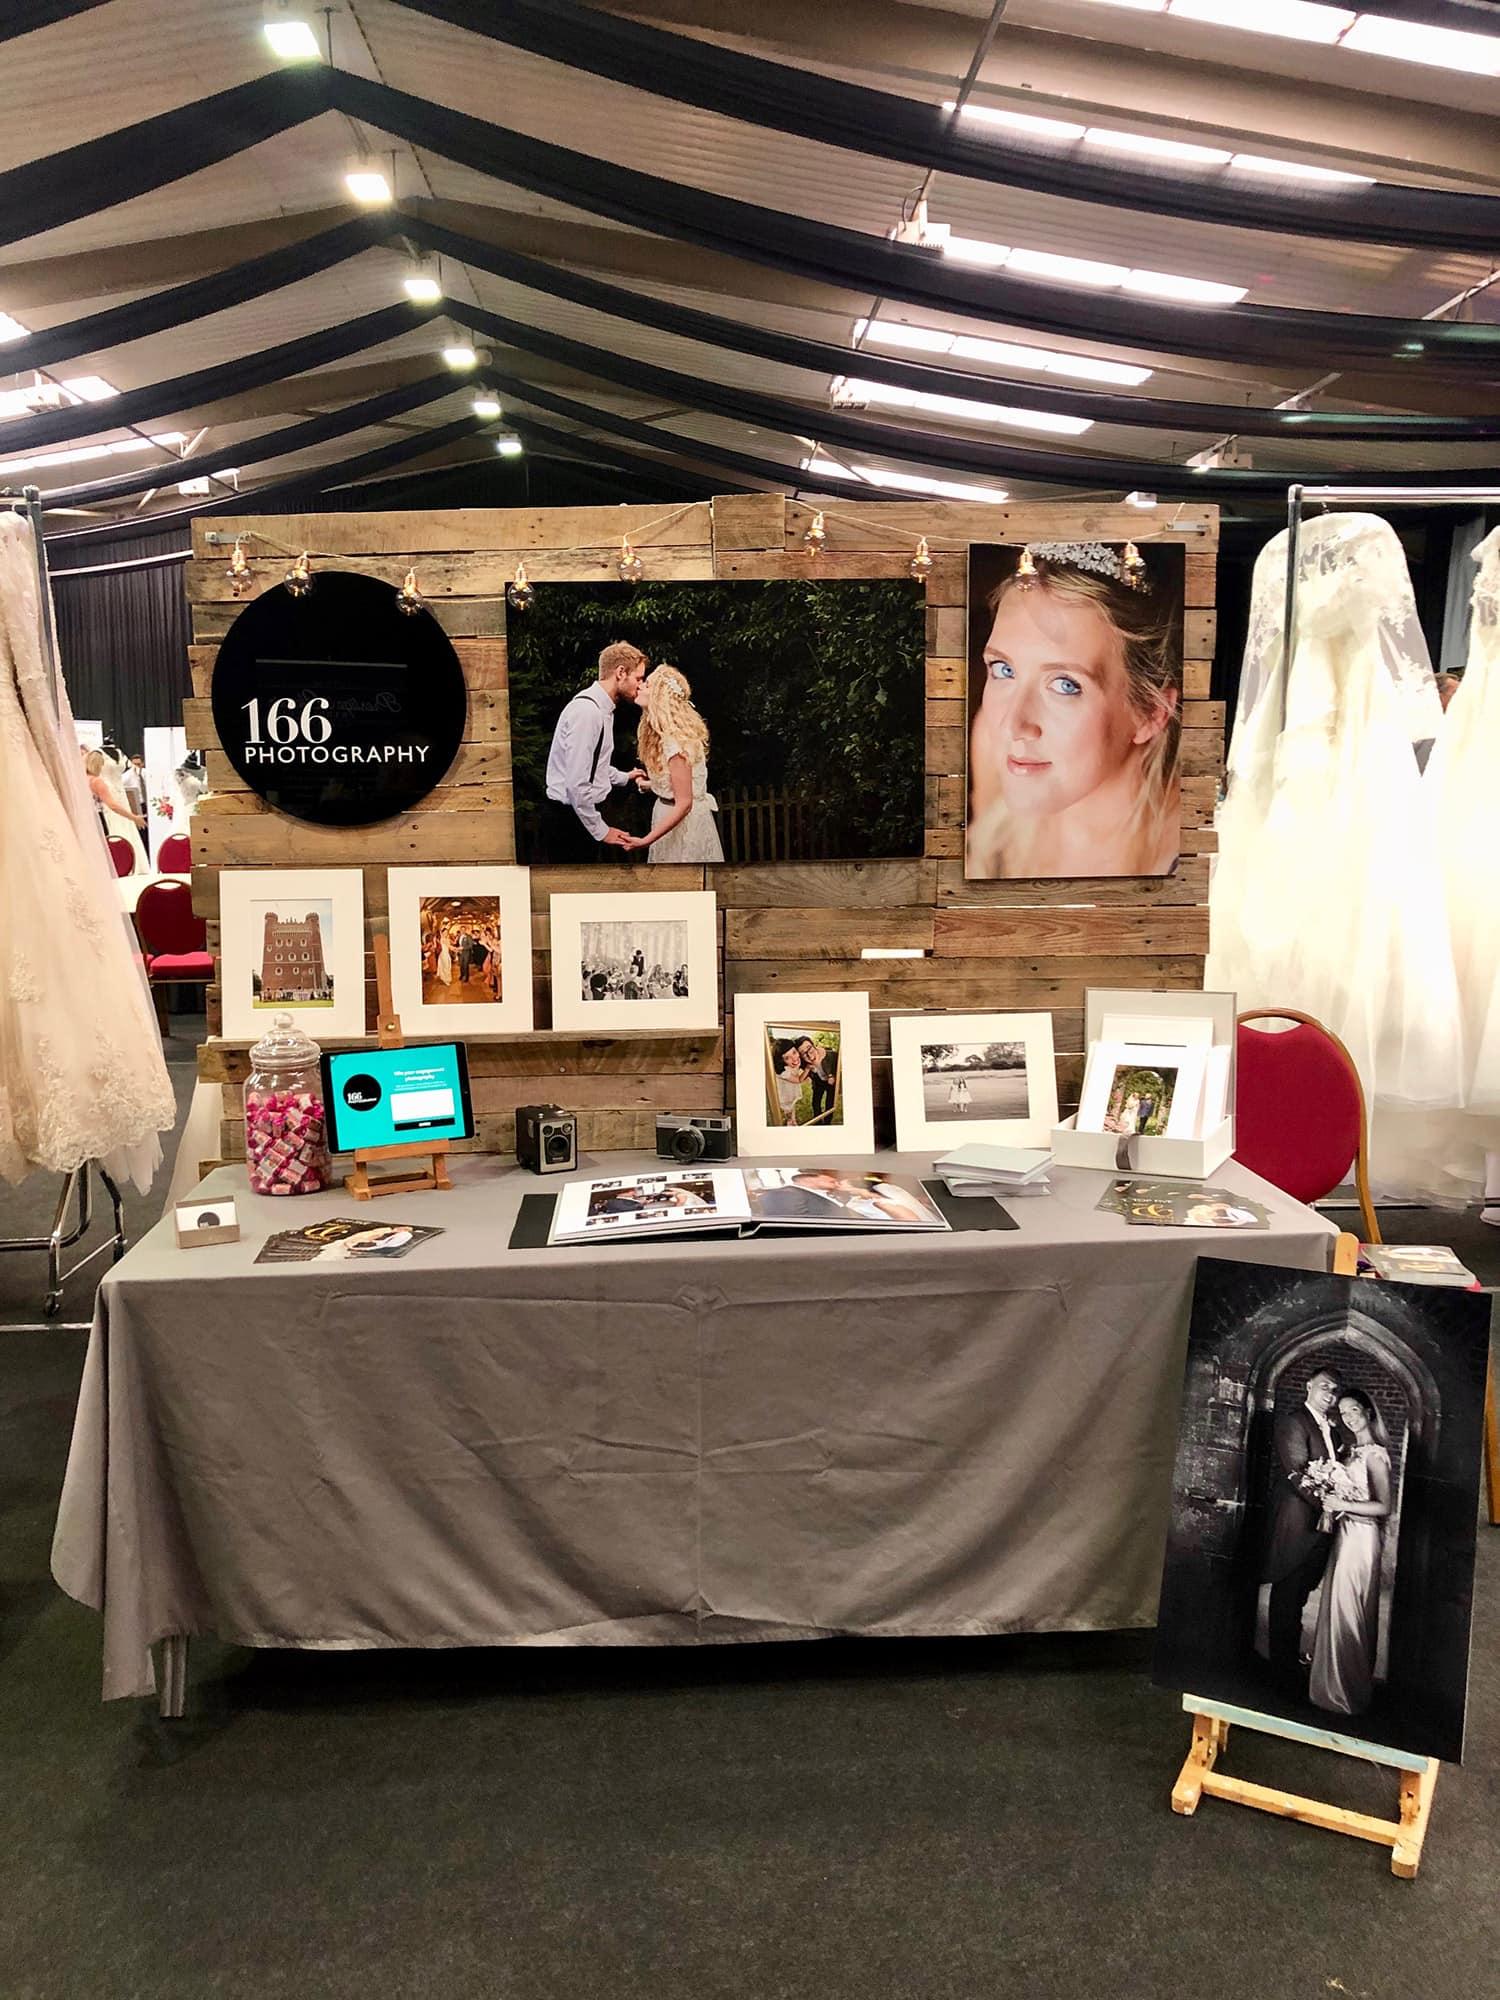 A wedding fair display for 166 photography